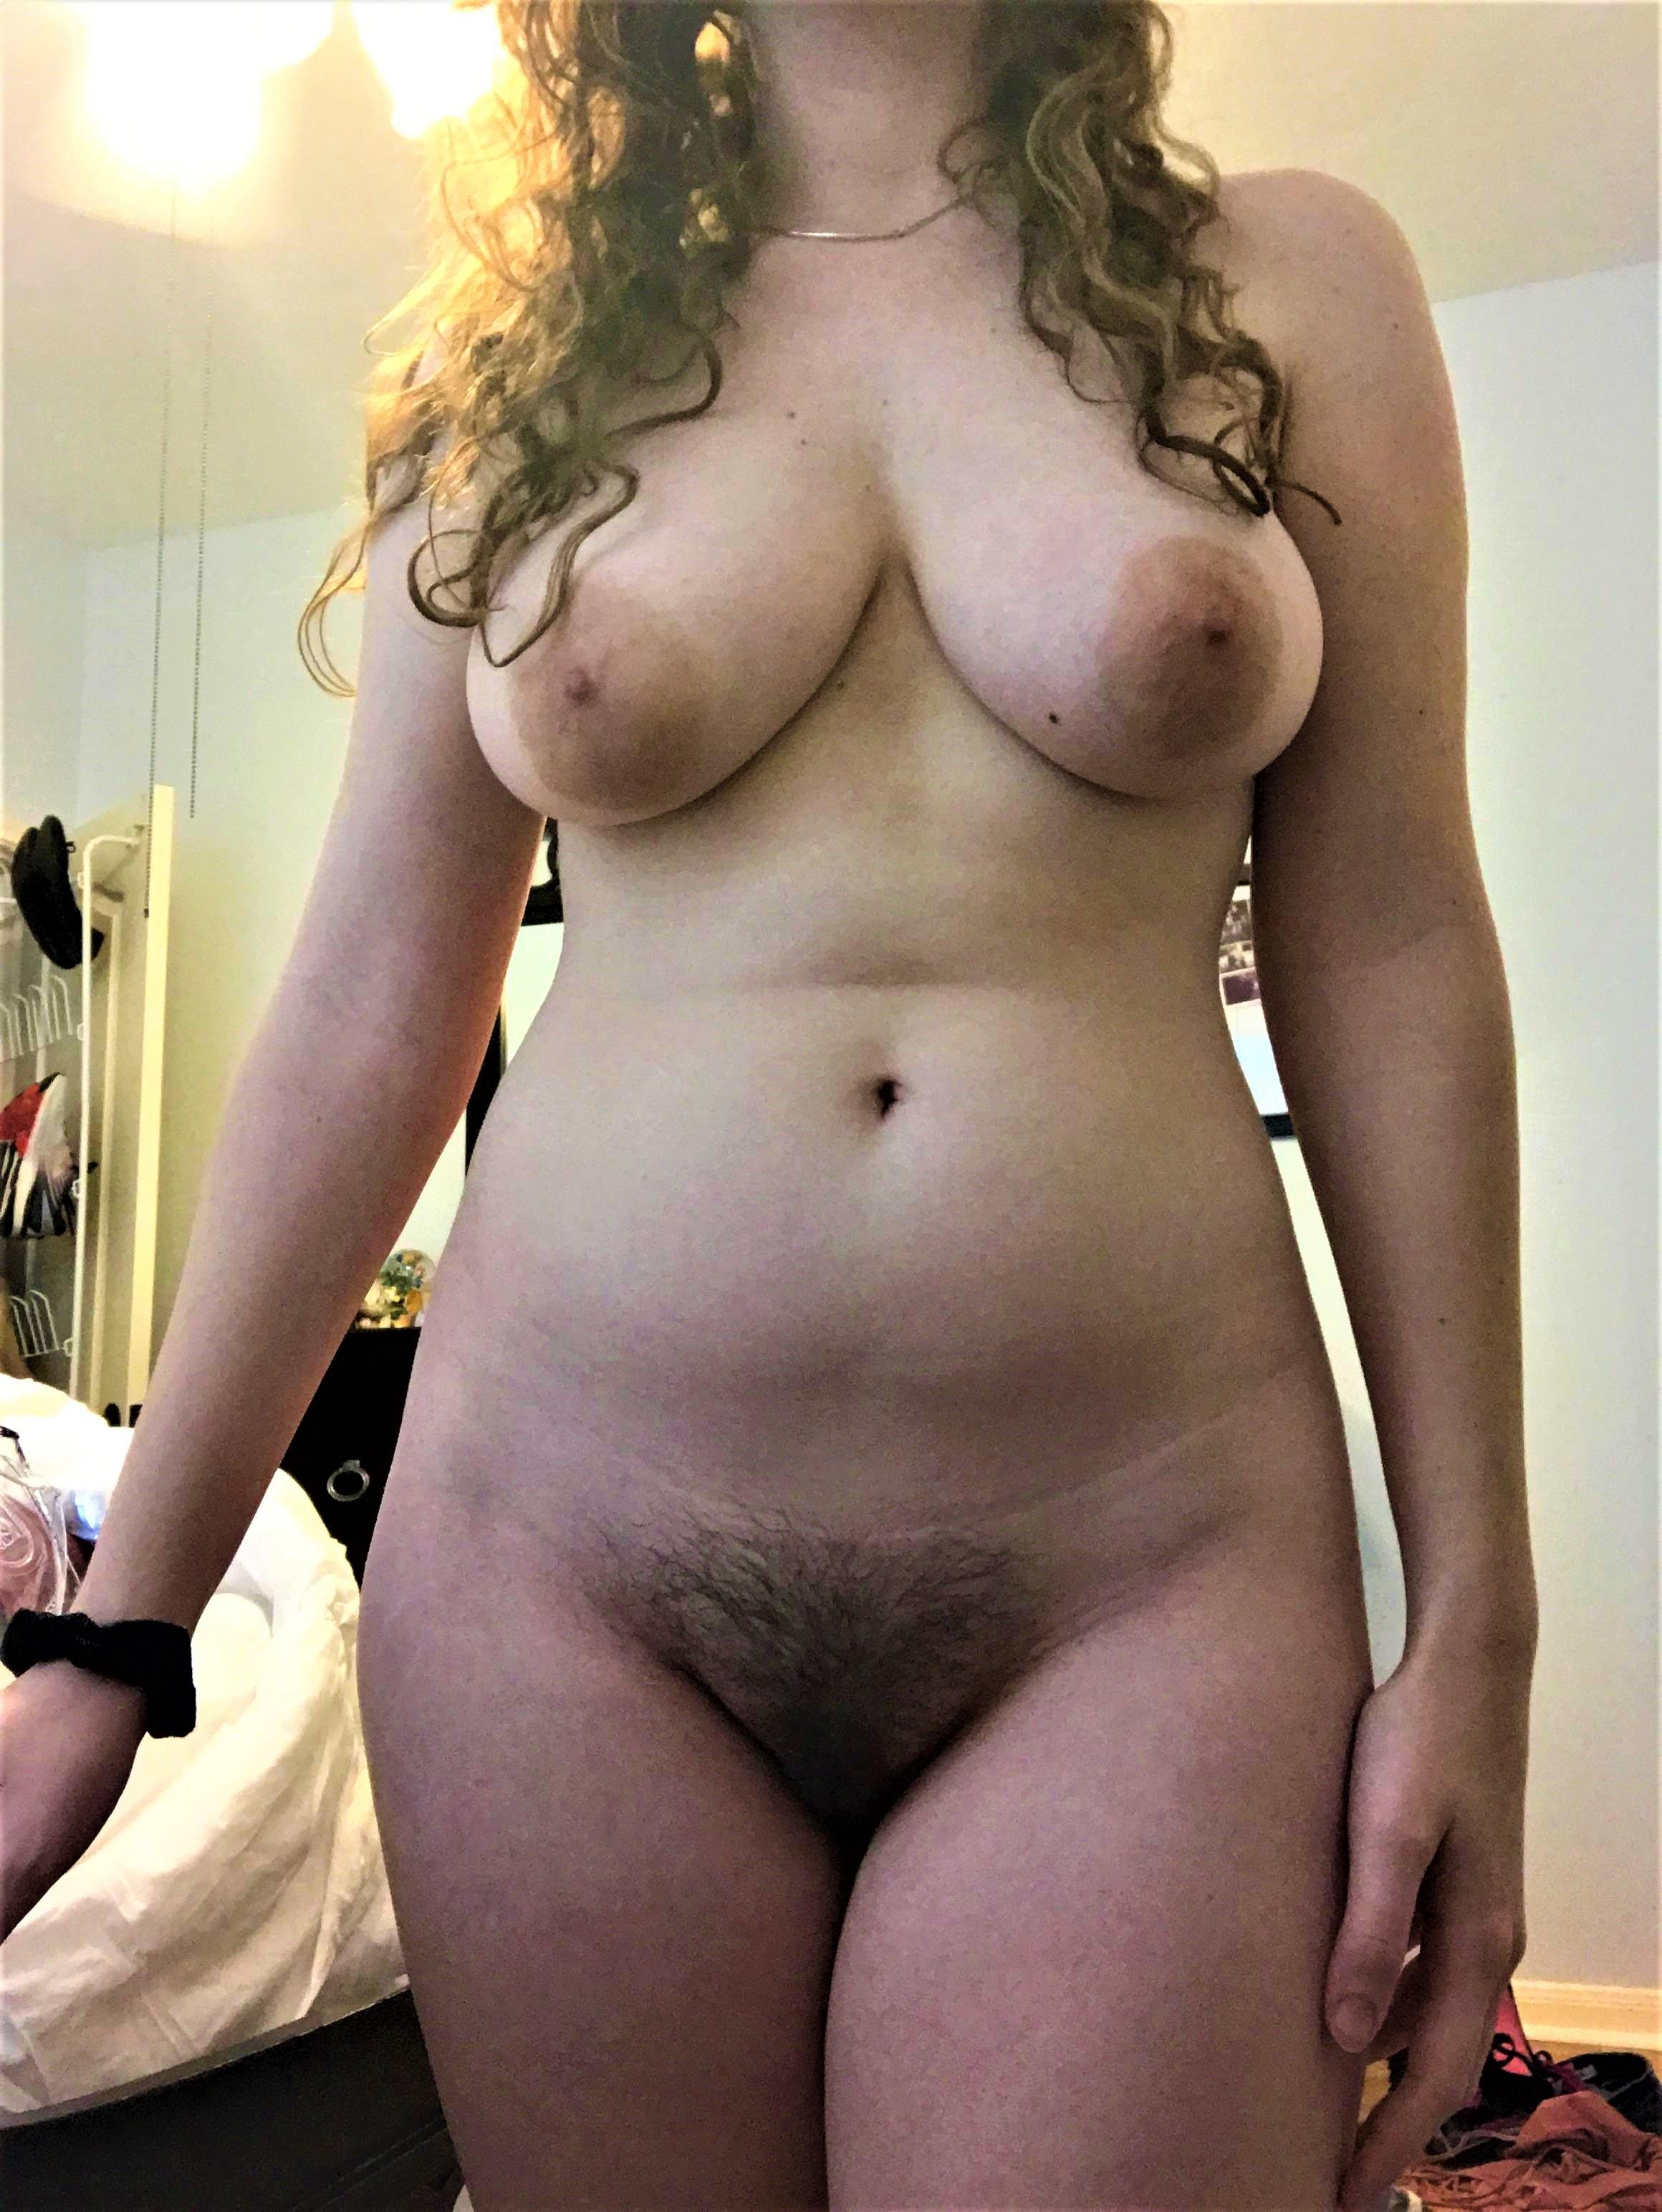 free handjob videos handjob sex movies handjob porn tube